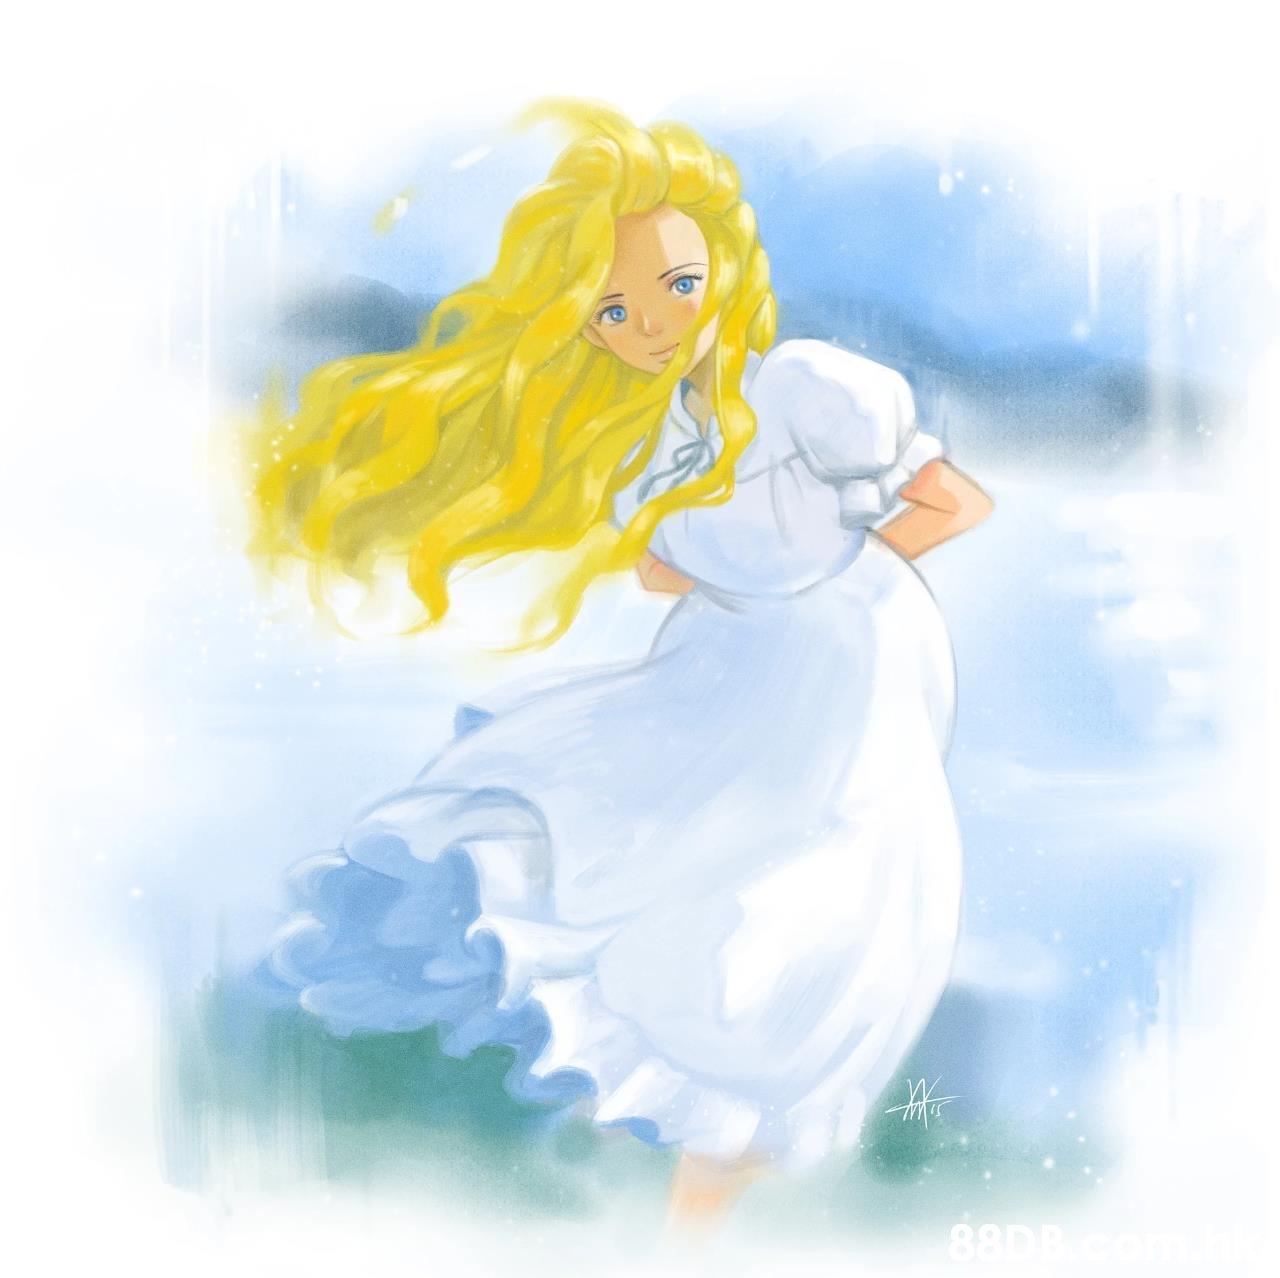 Cartoon,Anime,Illustration,Fictional character